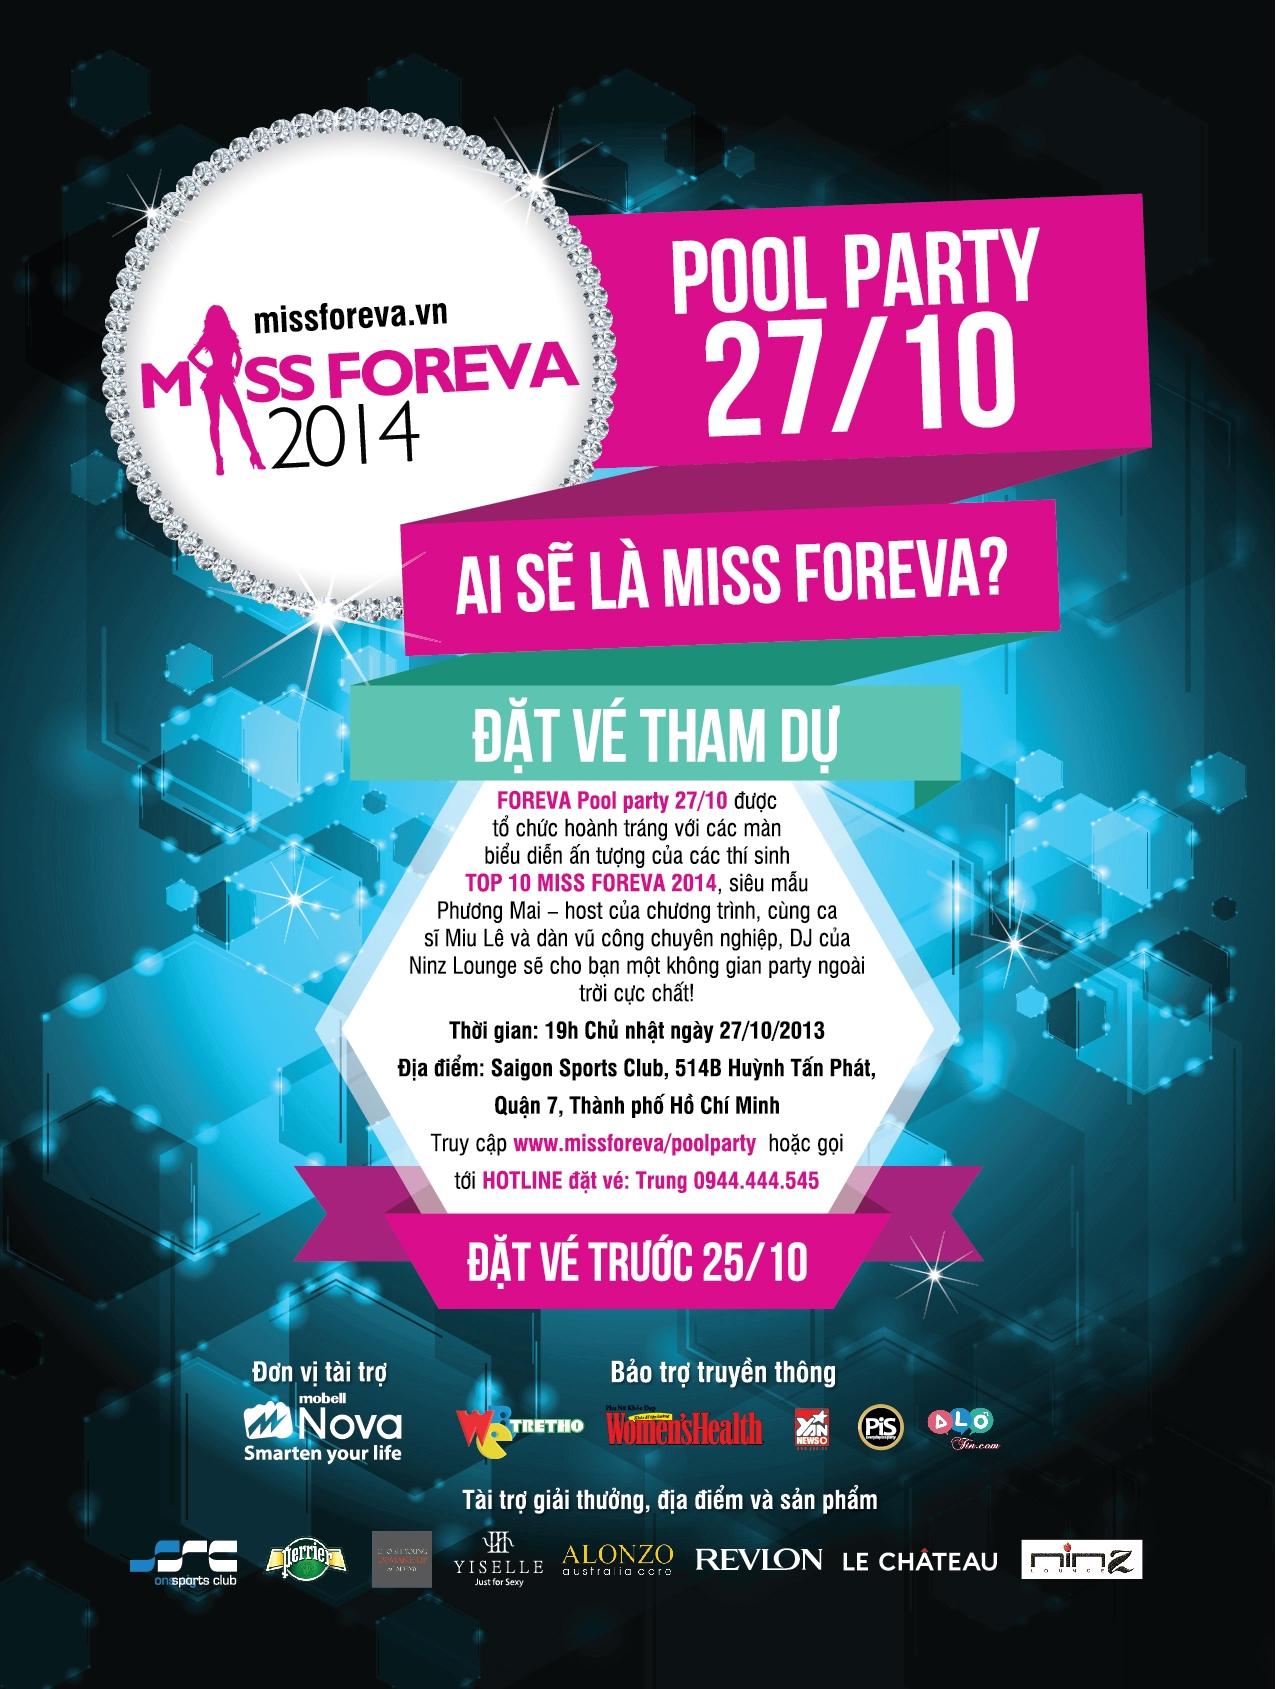 Hào hứng với FOREVA Pool Party